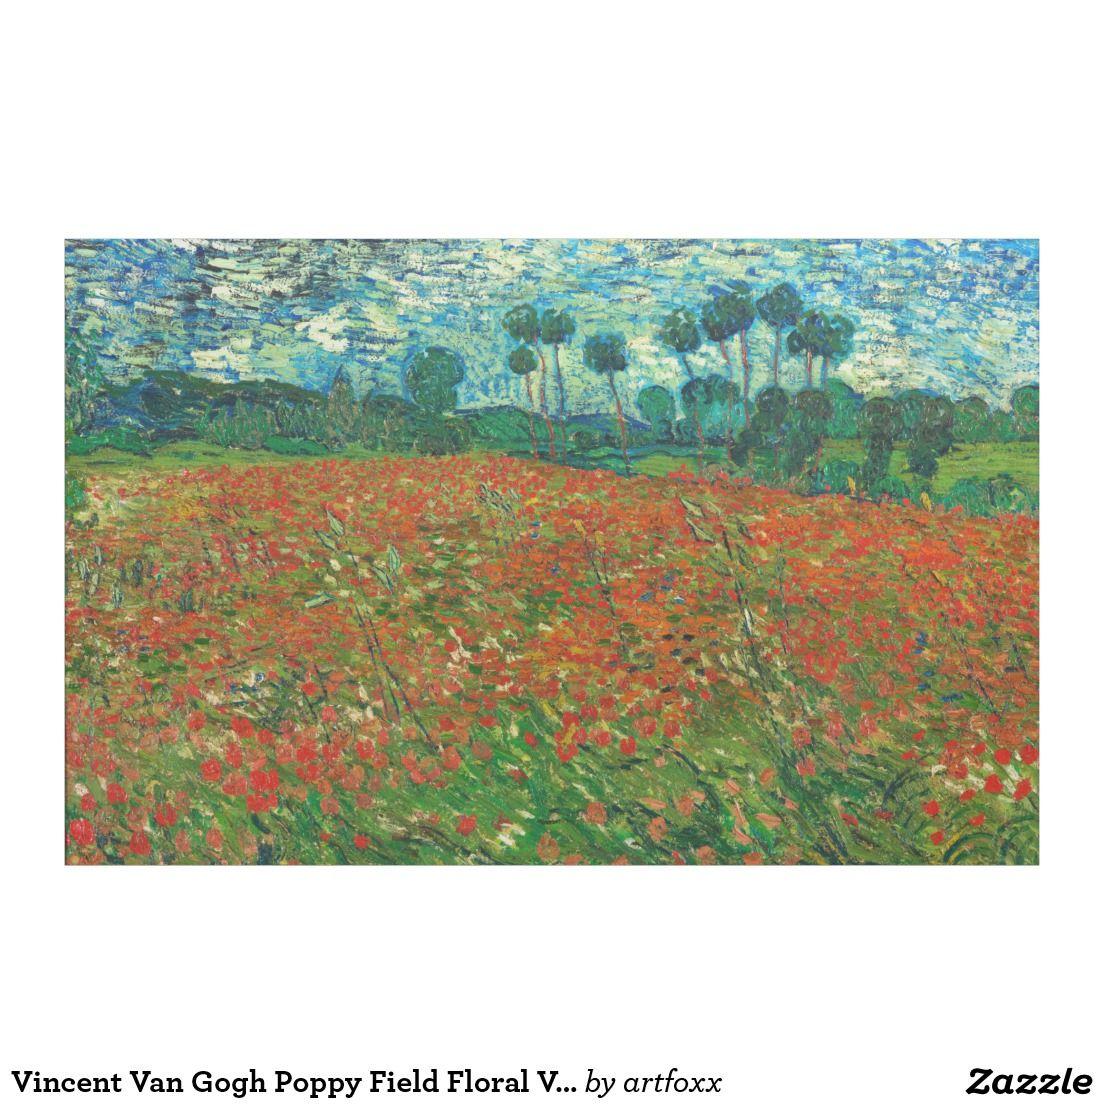 Vincent Van Gogh Poppy Field Floral Vintage Art Fabric Van Gogh